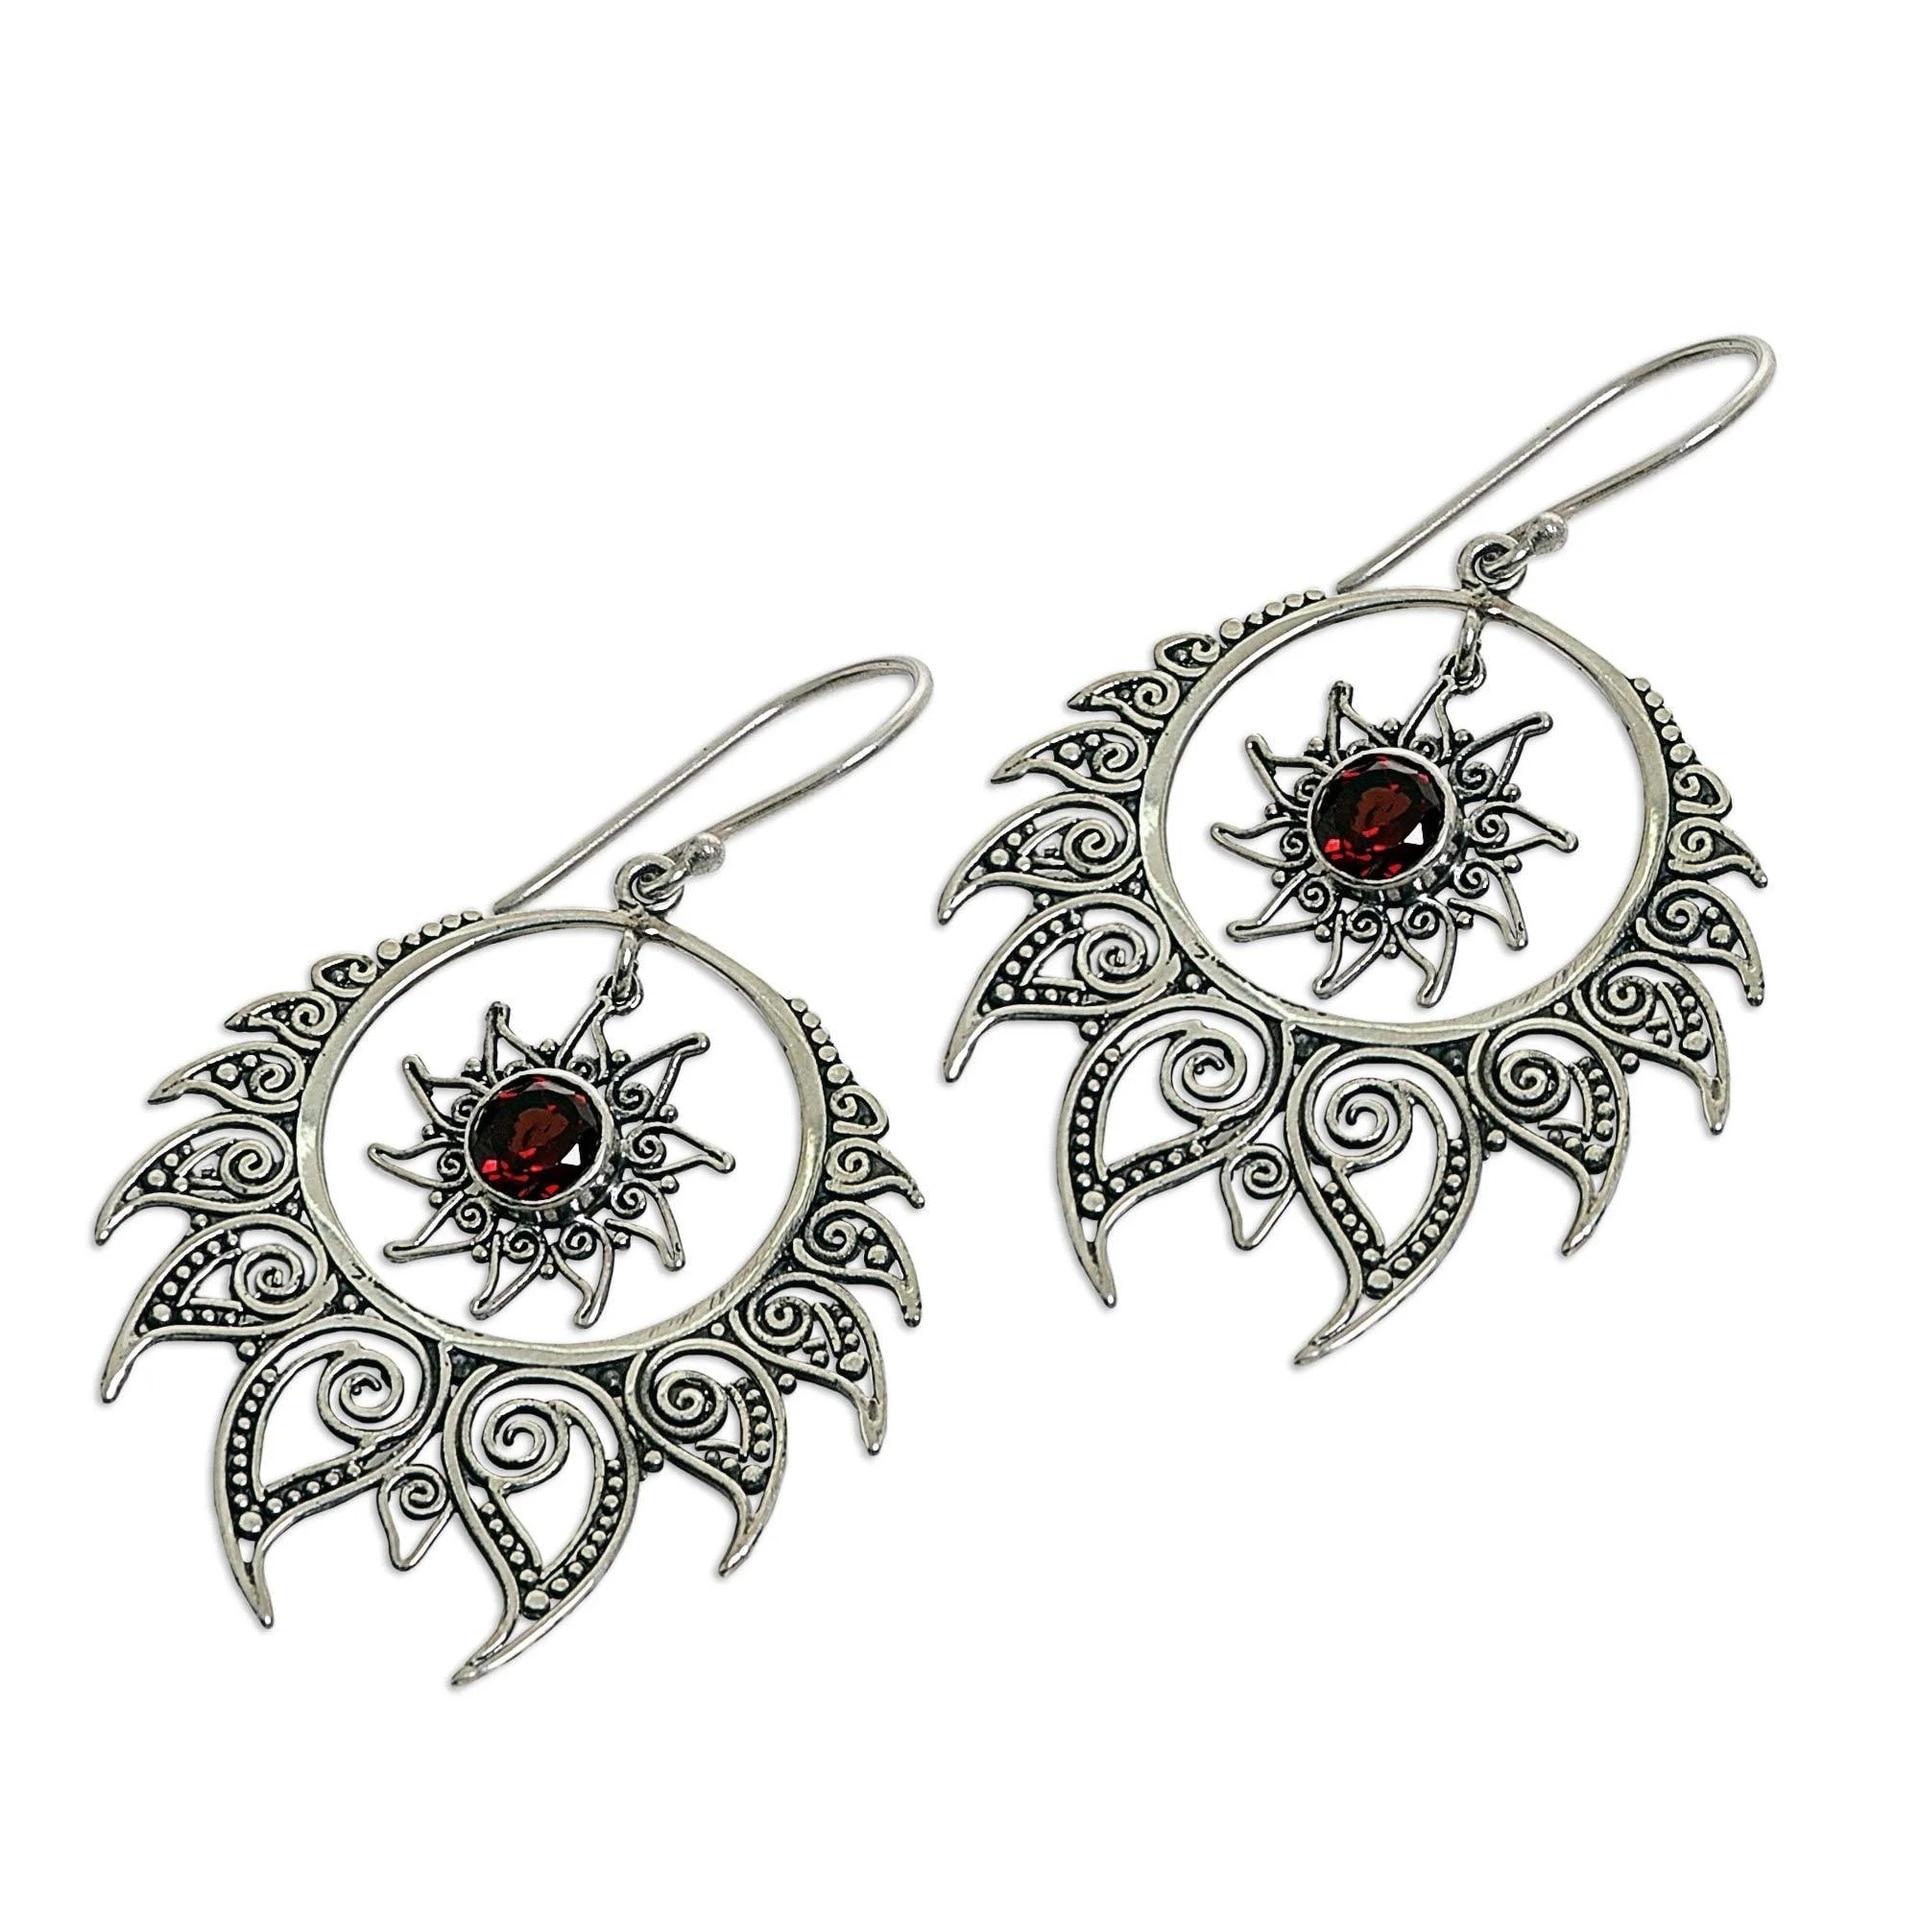 Solid s925 Silver Garnet Earring Exaggerated Brincos Bizuteria Gemstone Mujer Oreja 100% 925 Jewelry Topaz Drop Earring JEWELRY